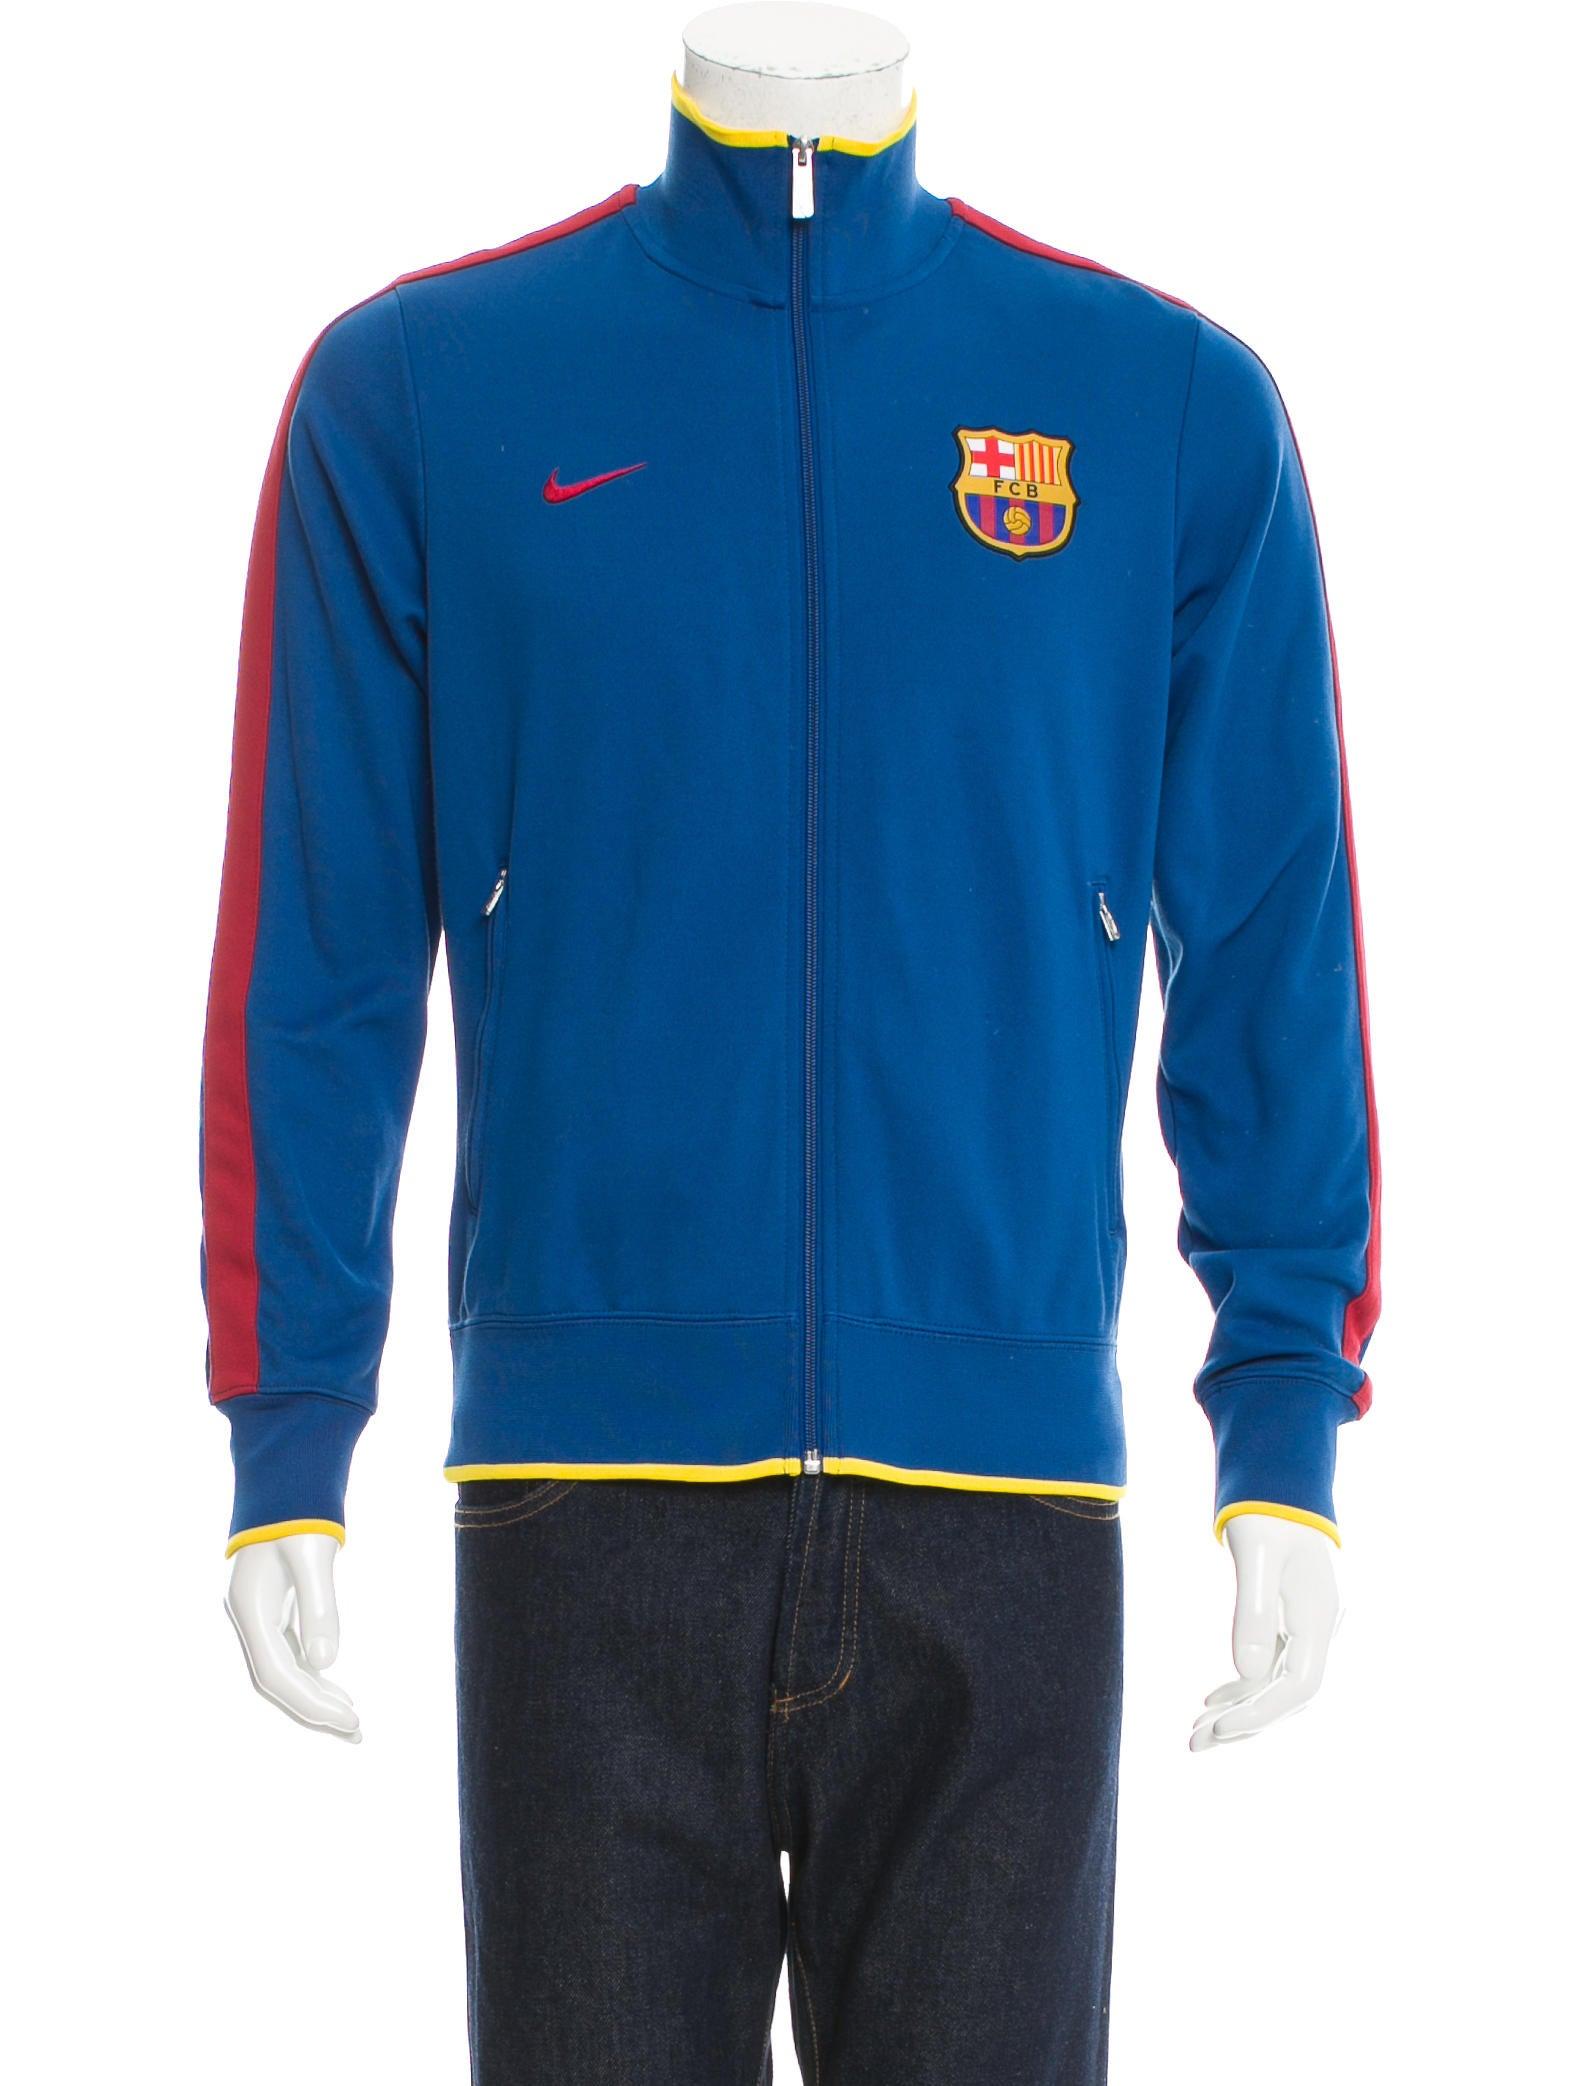 Nike FCB Track Jacket - Clothing - WU221035 | The RealReal